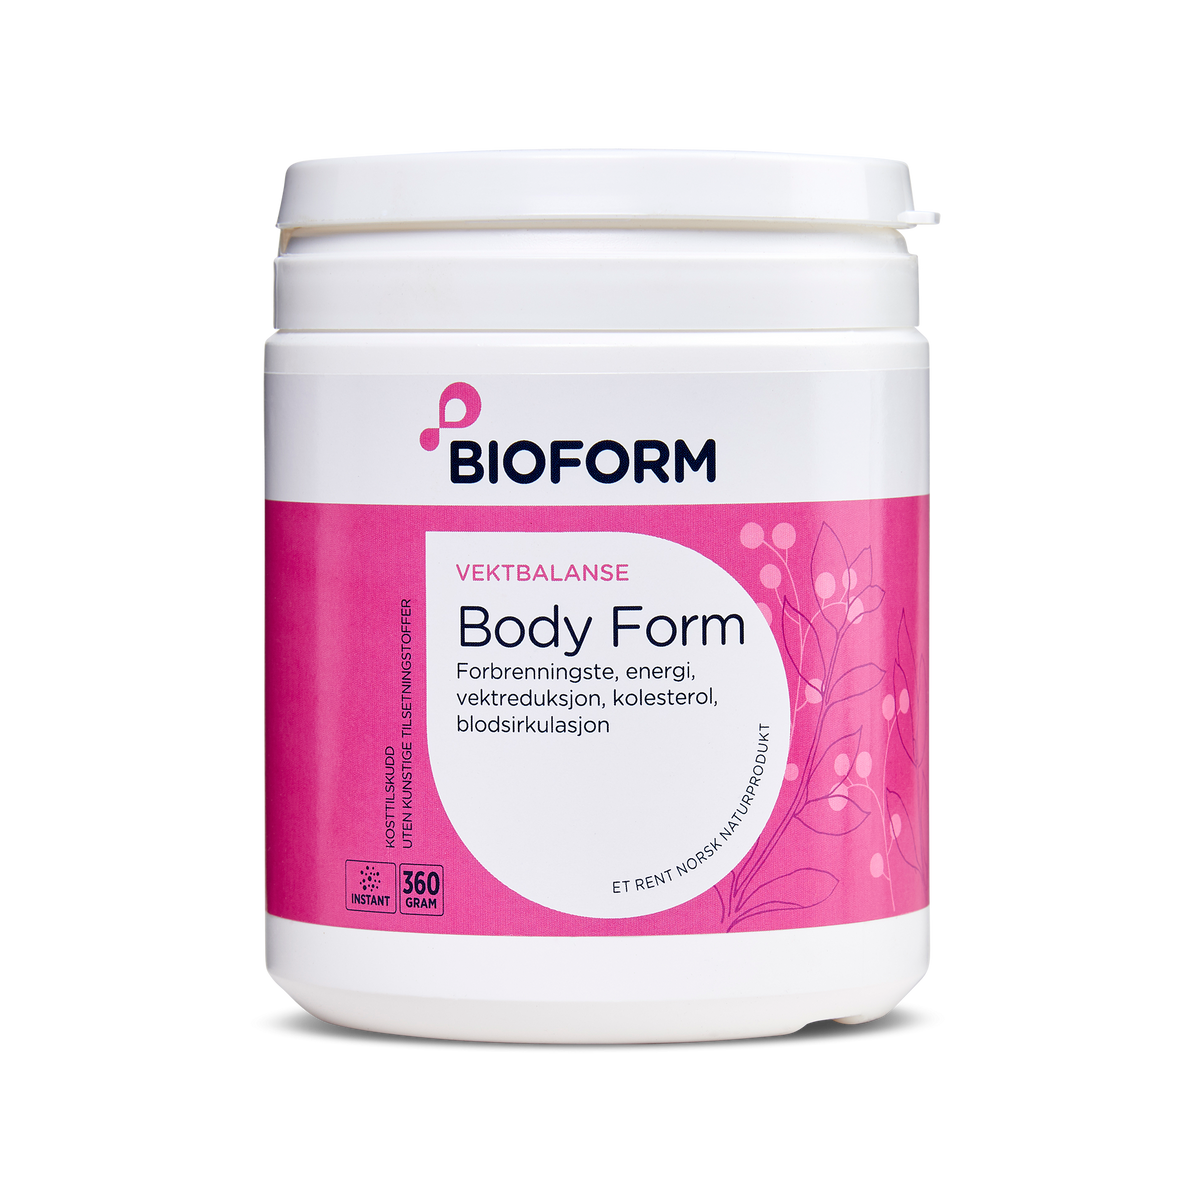 Body Form urtedrikke, 360 g